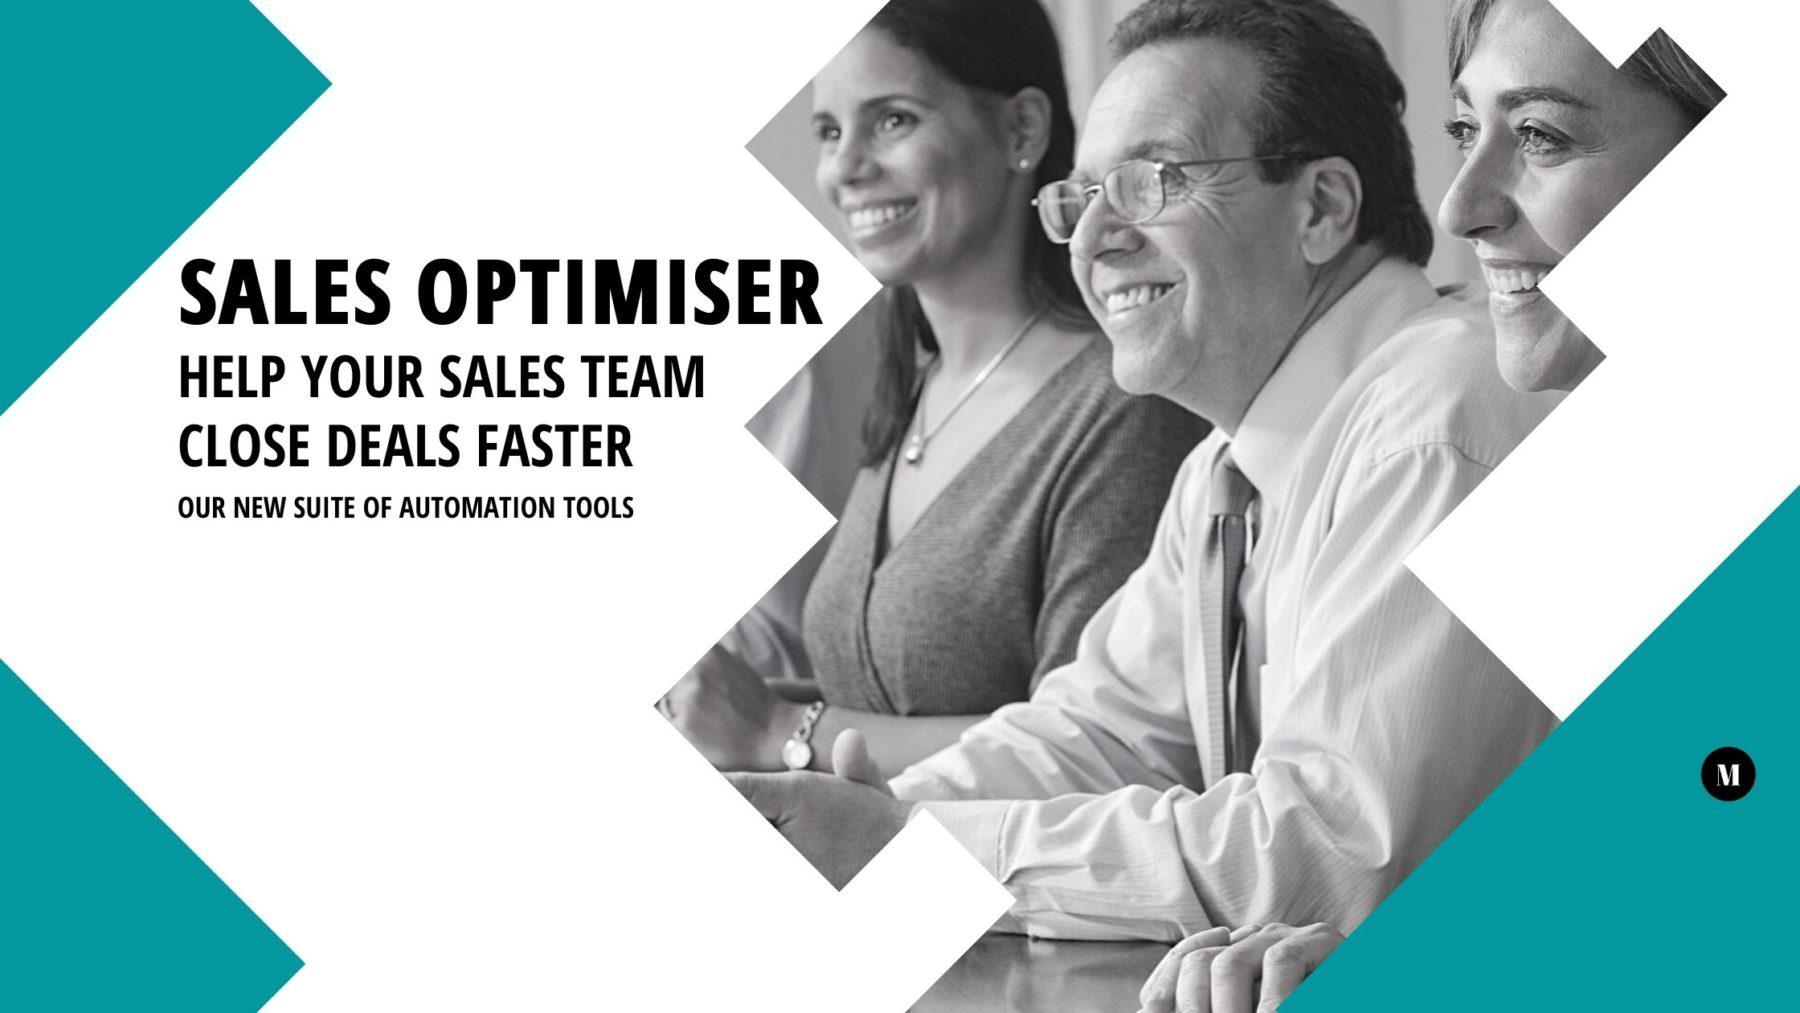 sales optimiSer